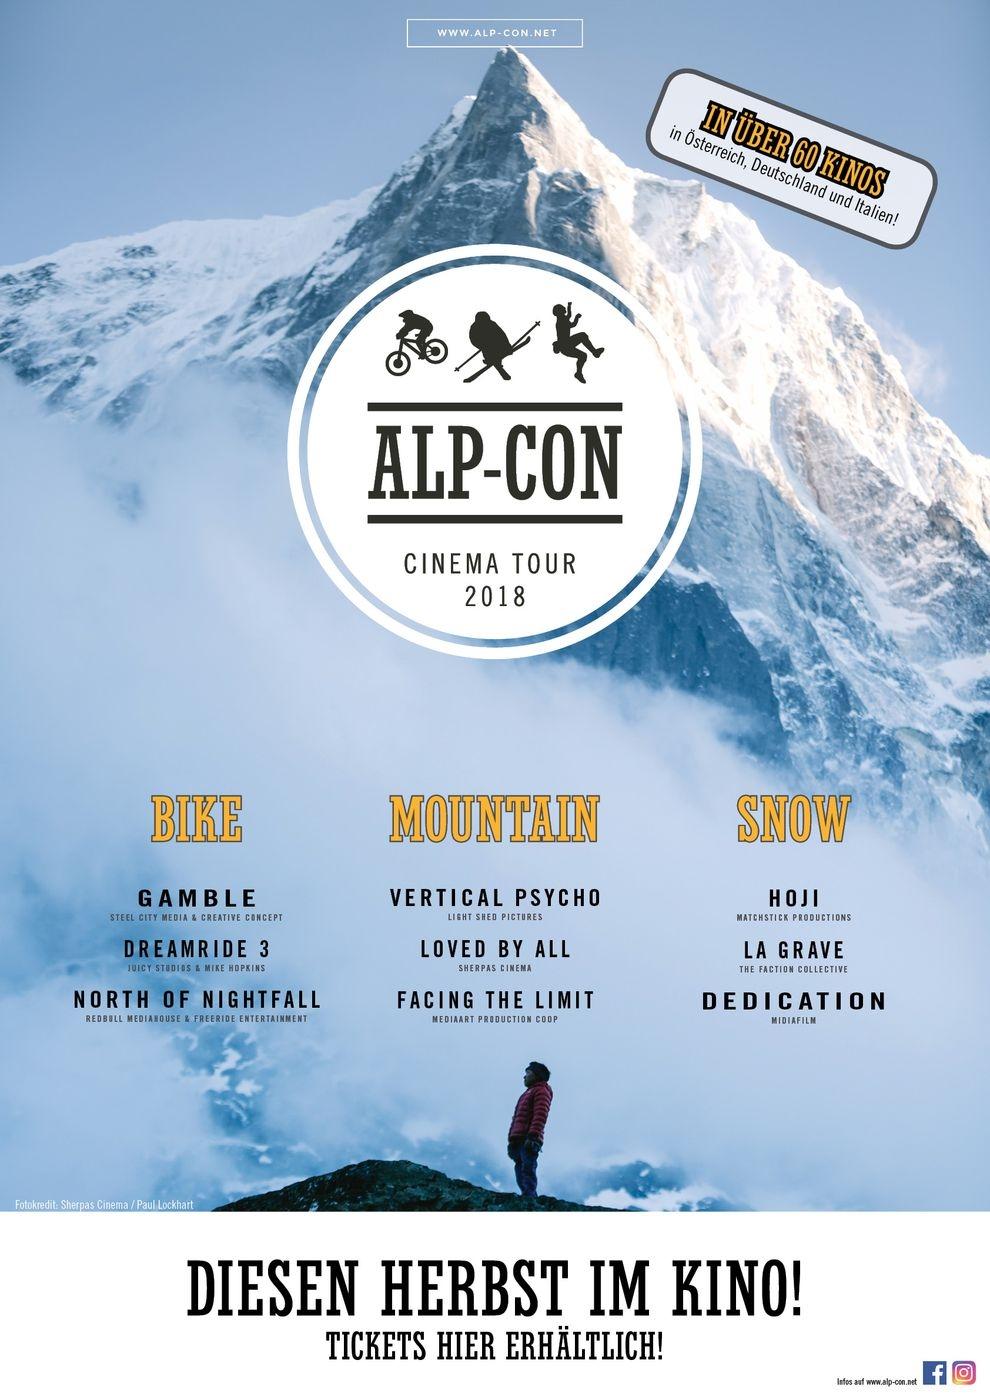 Alp-Con CinemaTour 2018: SNOW (Poster)